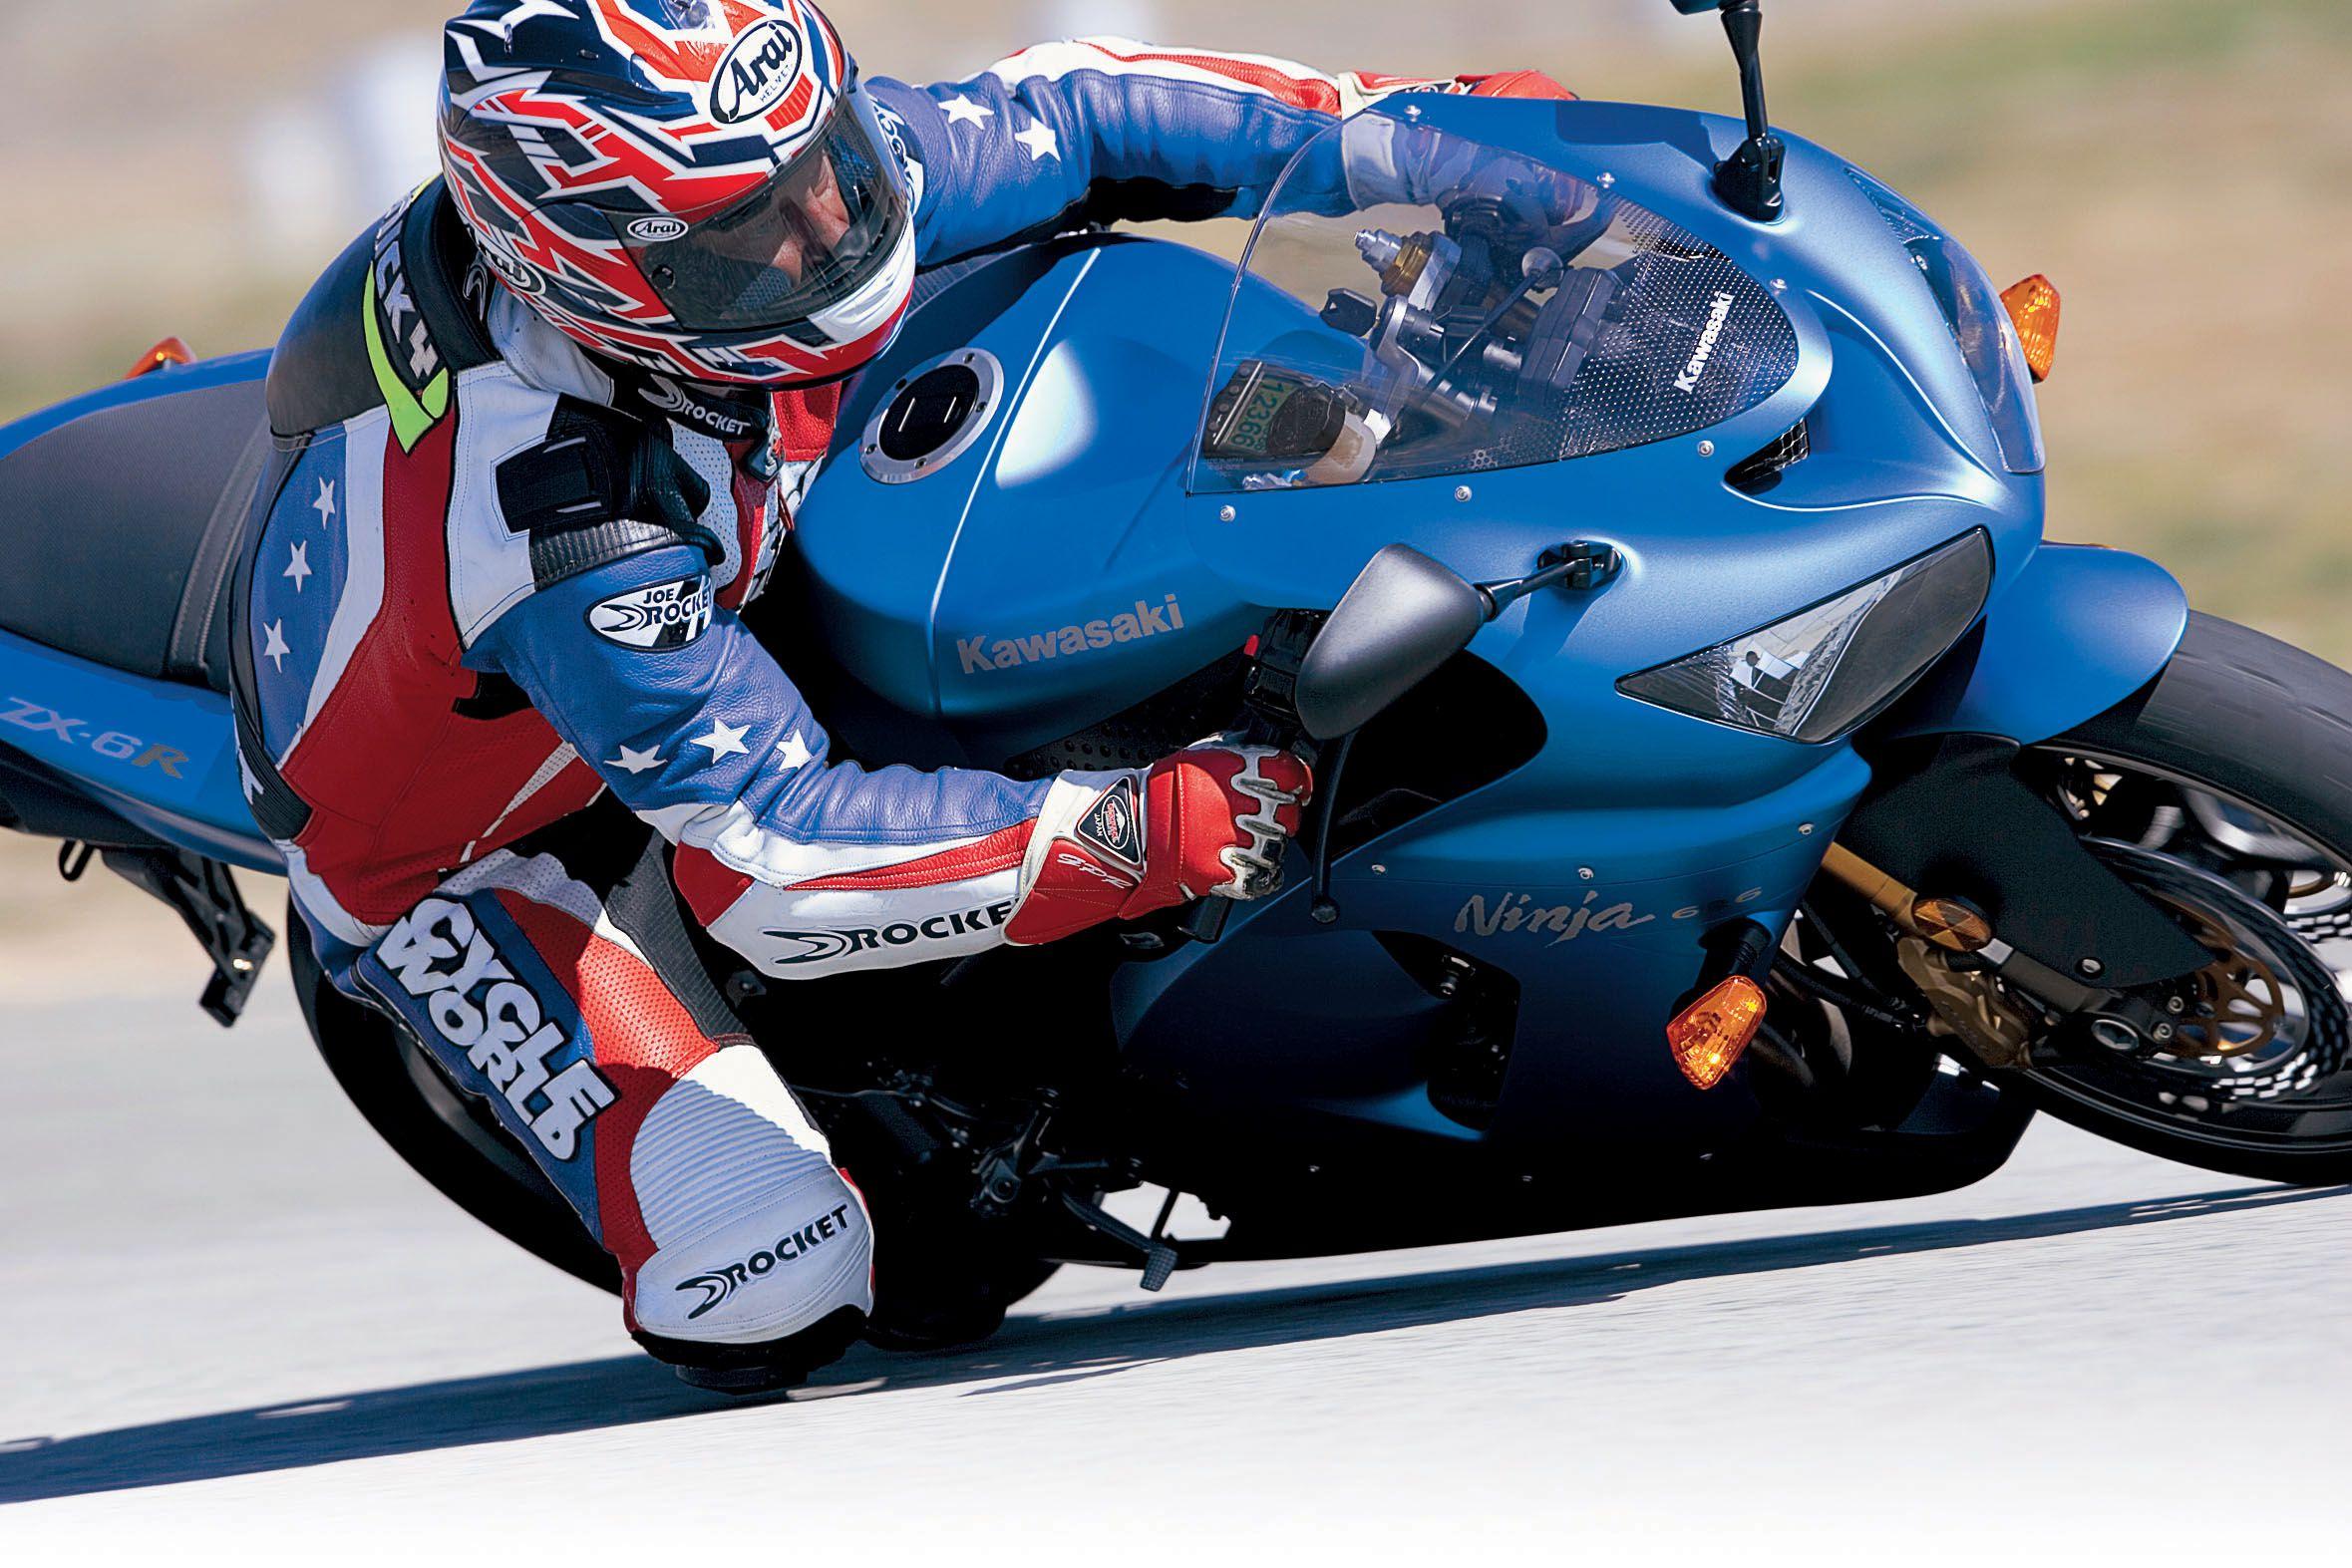 Honda Cbr600rr Vs Kawasaki Zx 6r Vs Suzuki Gsx R600 Vs Triumph